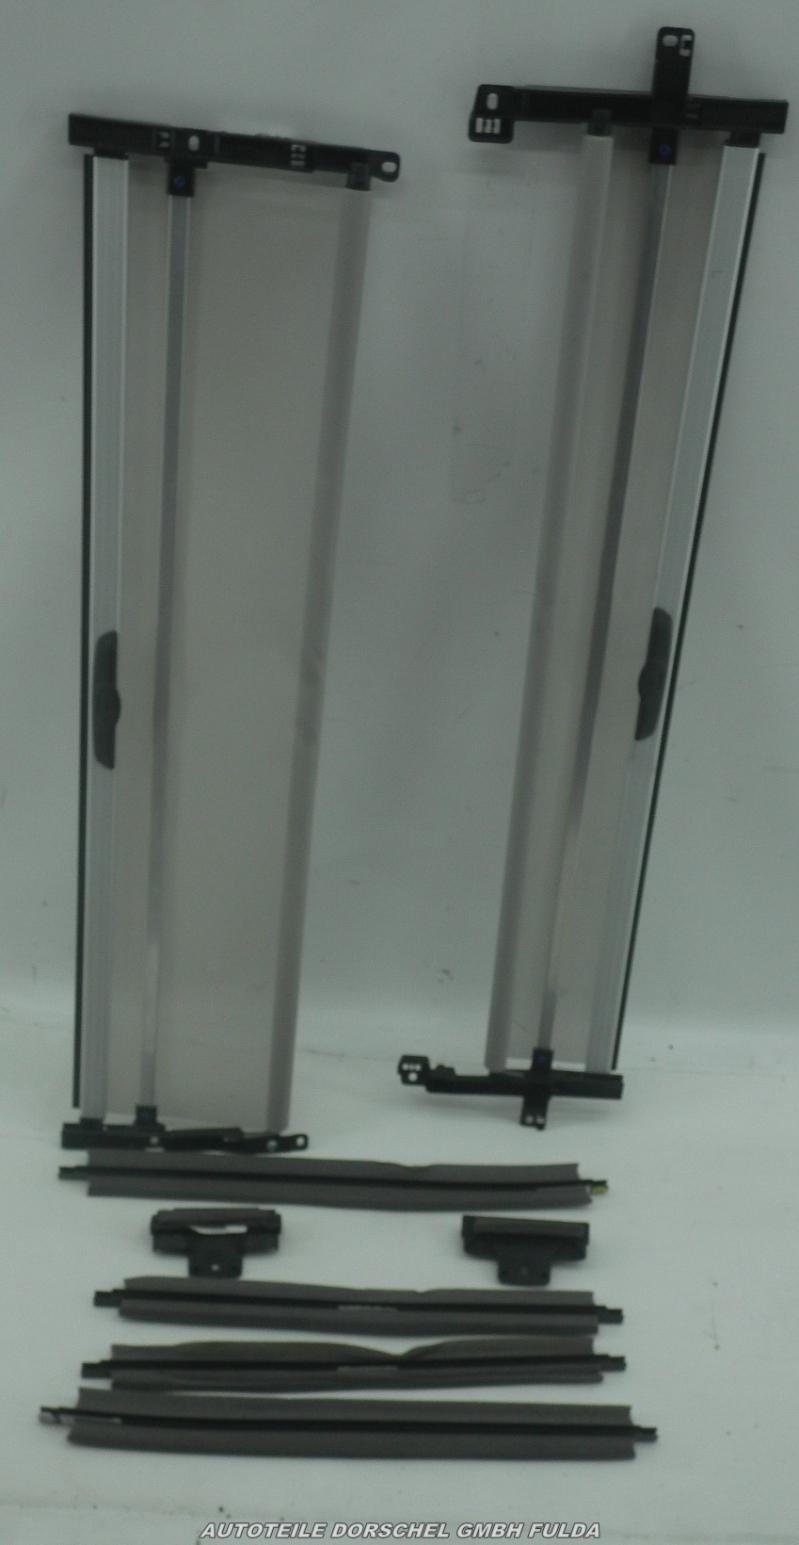 FORD Kuga Verkleidung Dachrahmen 7M51-R519E20-BFW Abdeckung Rolle | eBay